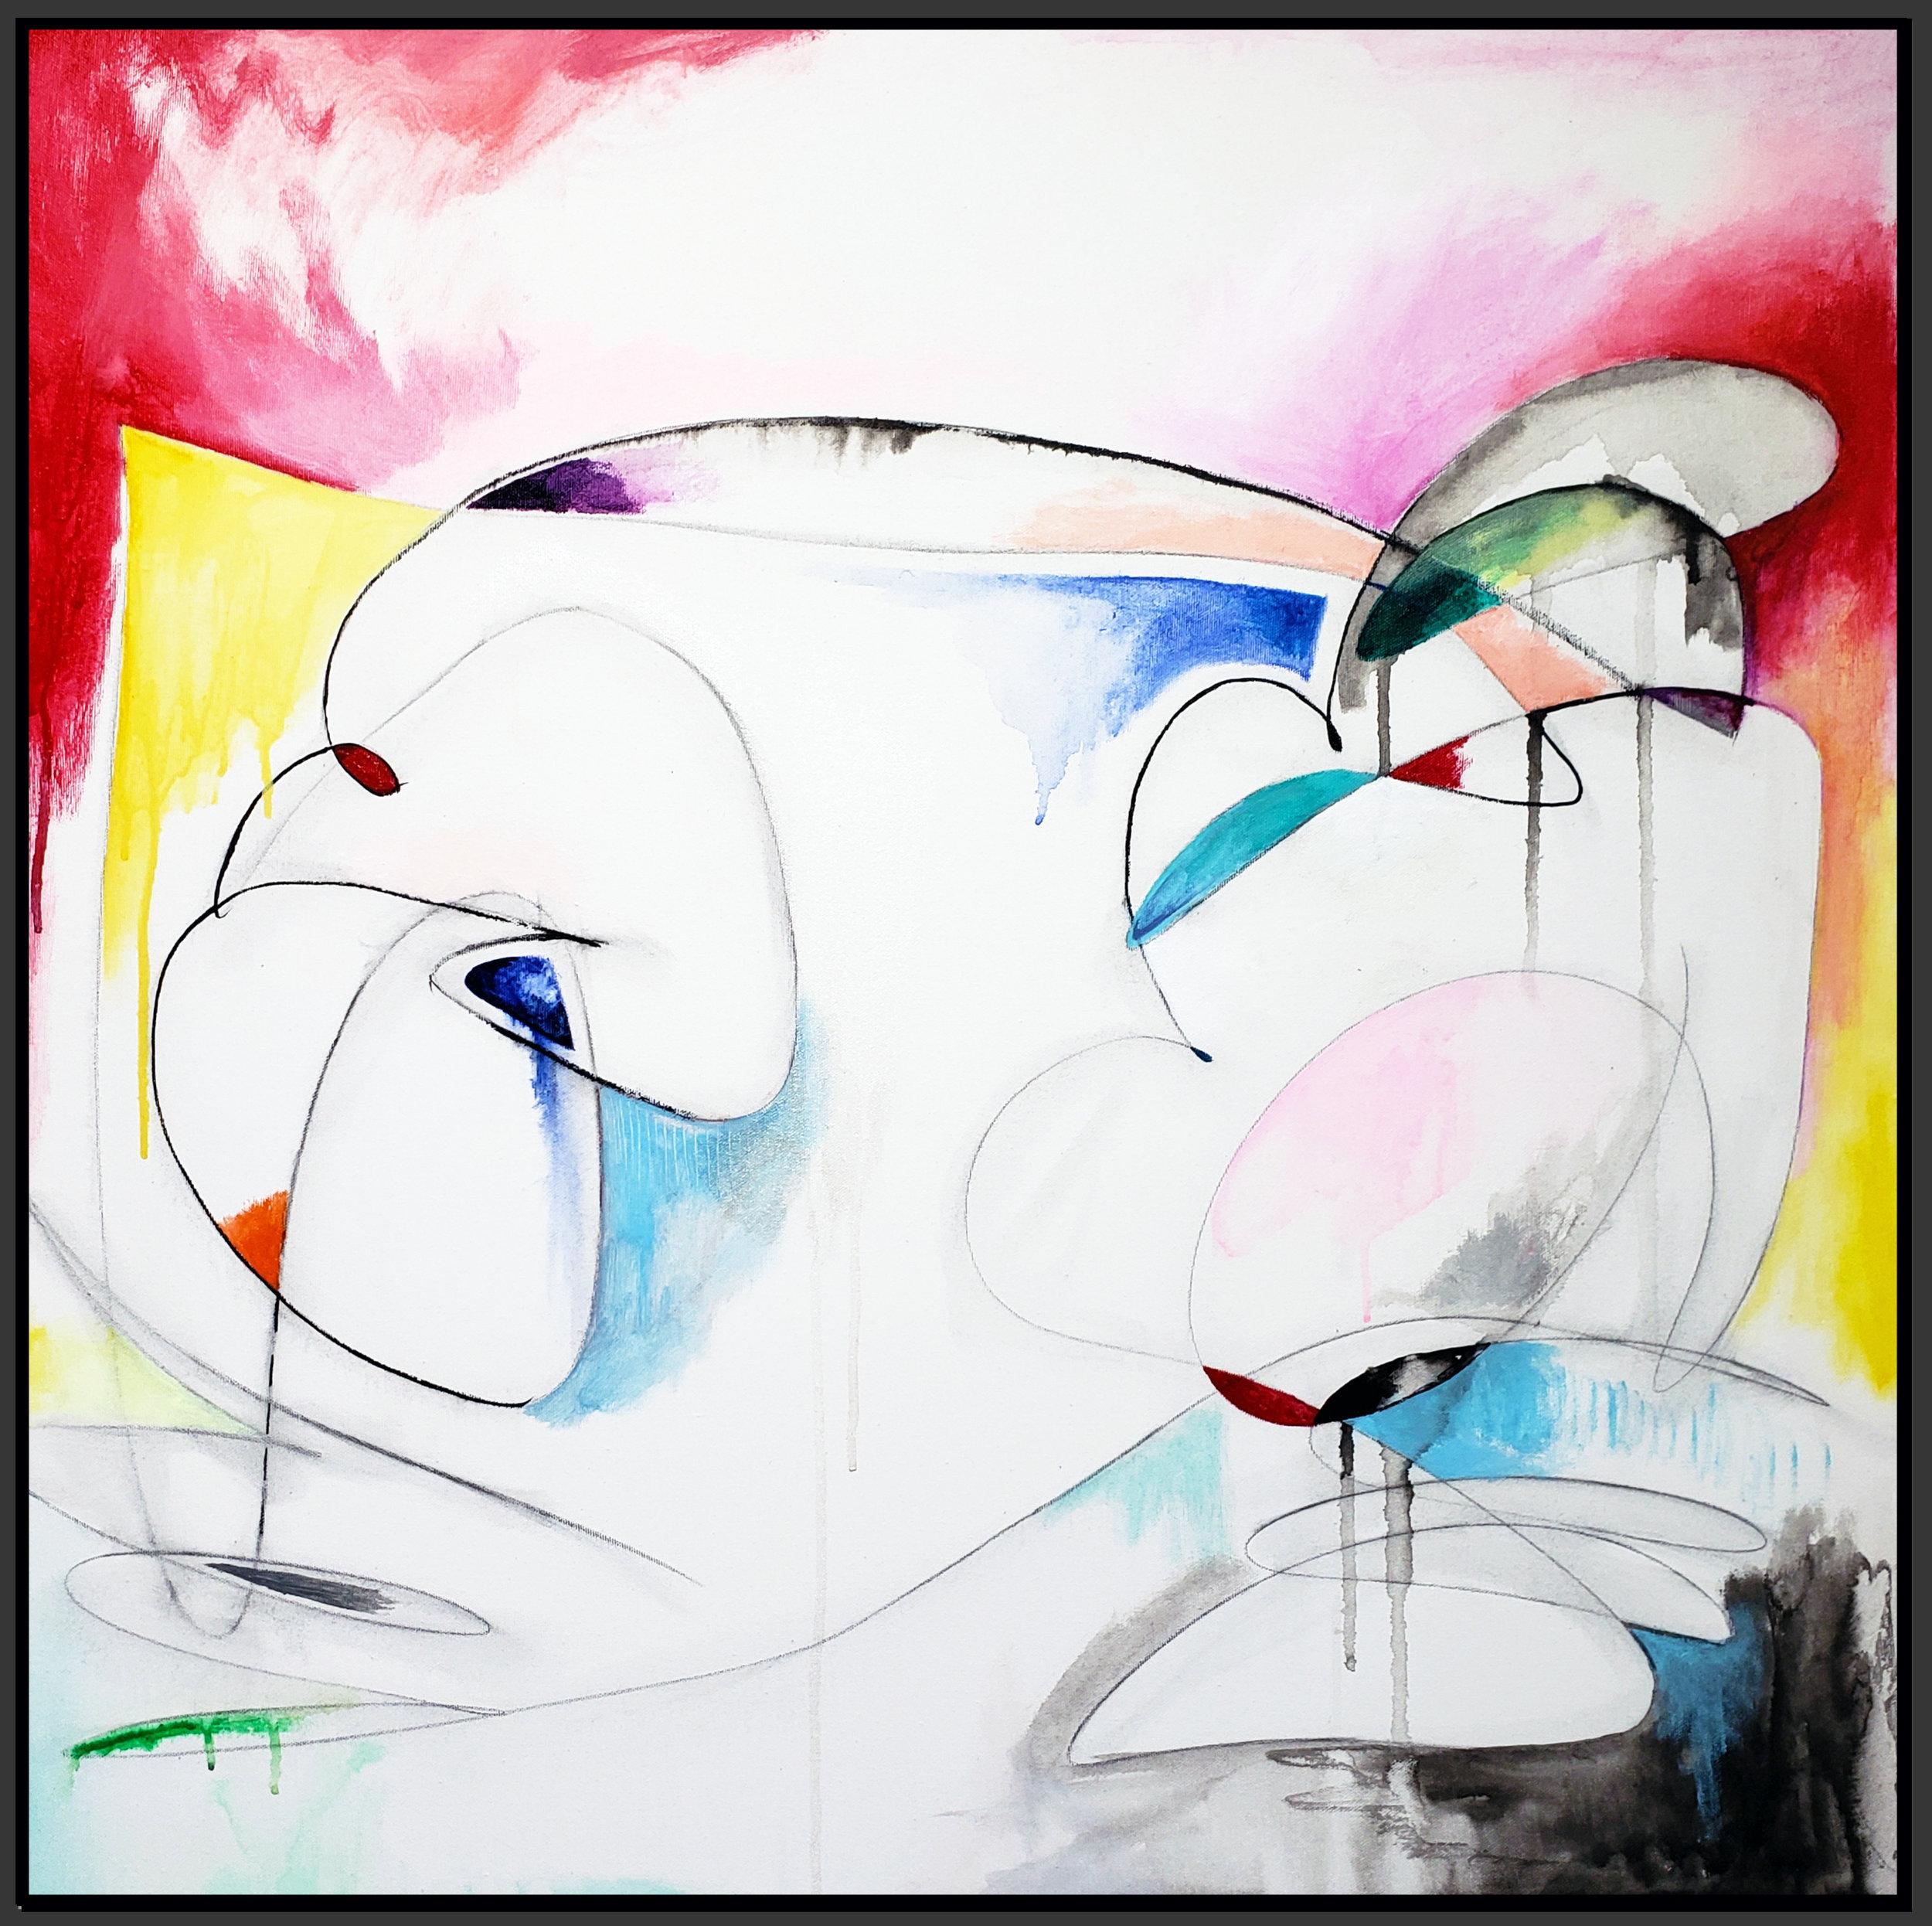 "Untitled #100, 2019, acrylic on canvas, 30"" x 30"" (76 x 76 cm)"